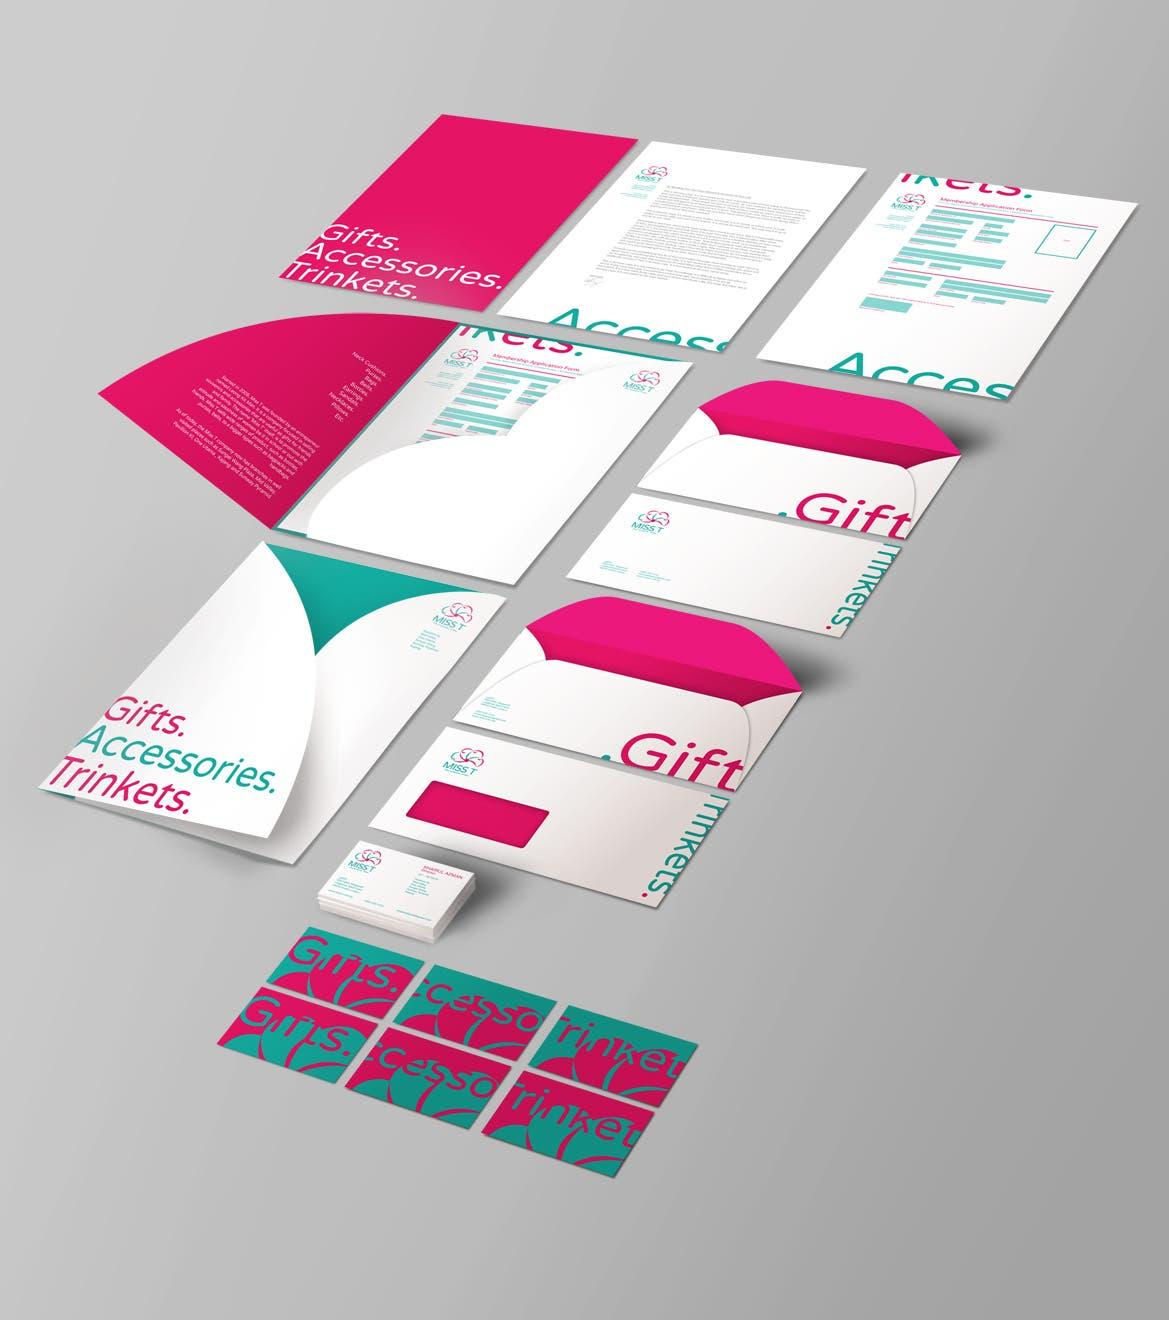 Gift Shop Identity Rebranding